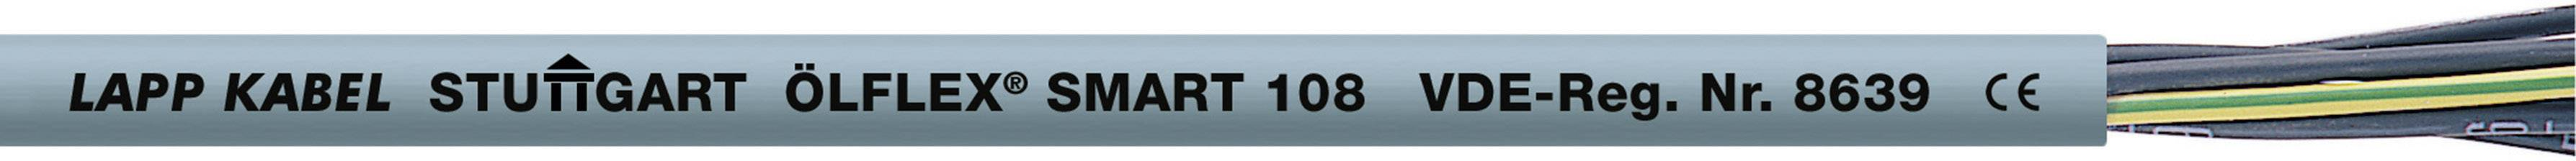 Lapp Kabel ÖLFLEX CLASSIC 110 5x1,5mm² Steuerleitung 1119305 Meterware